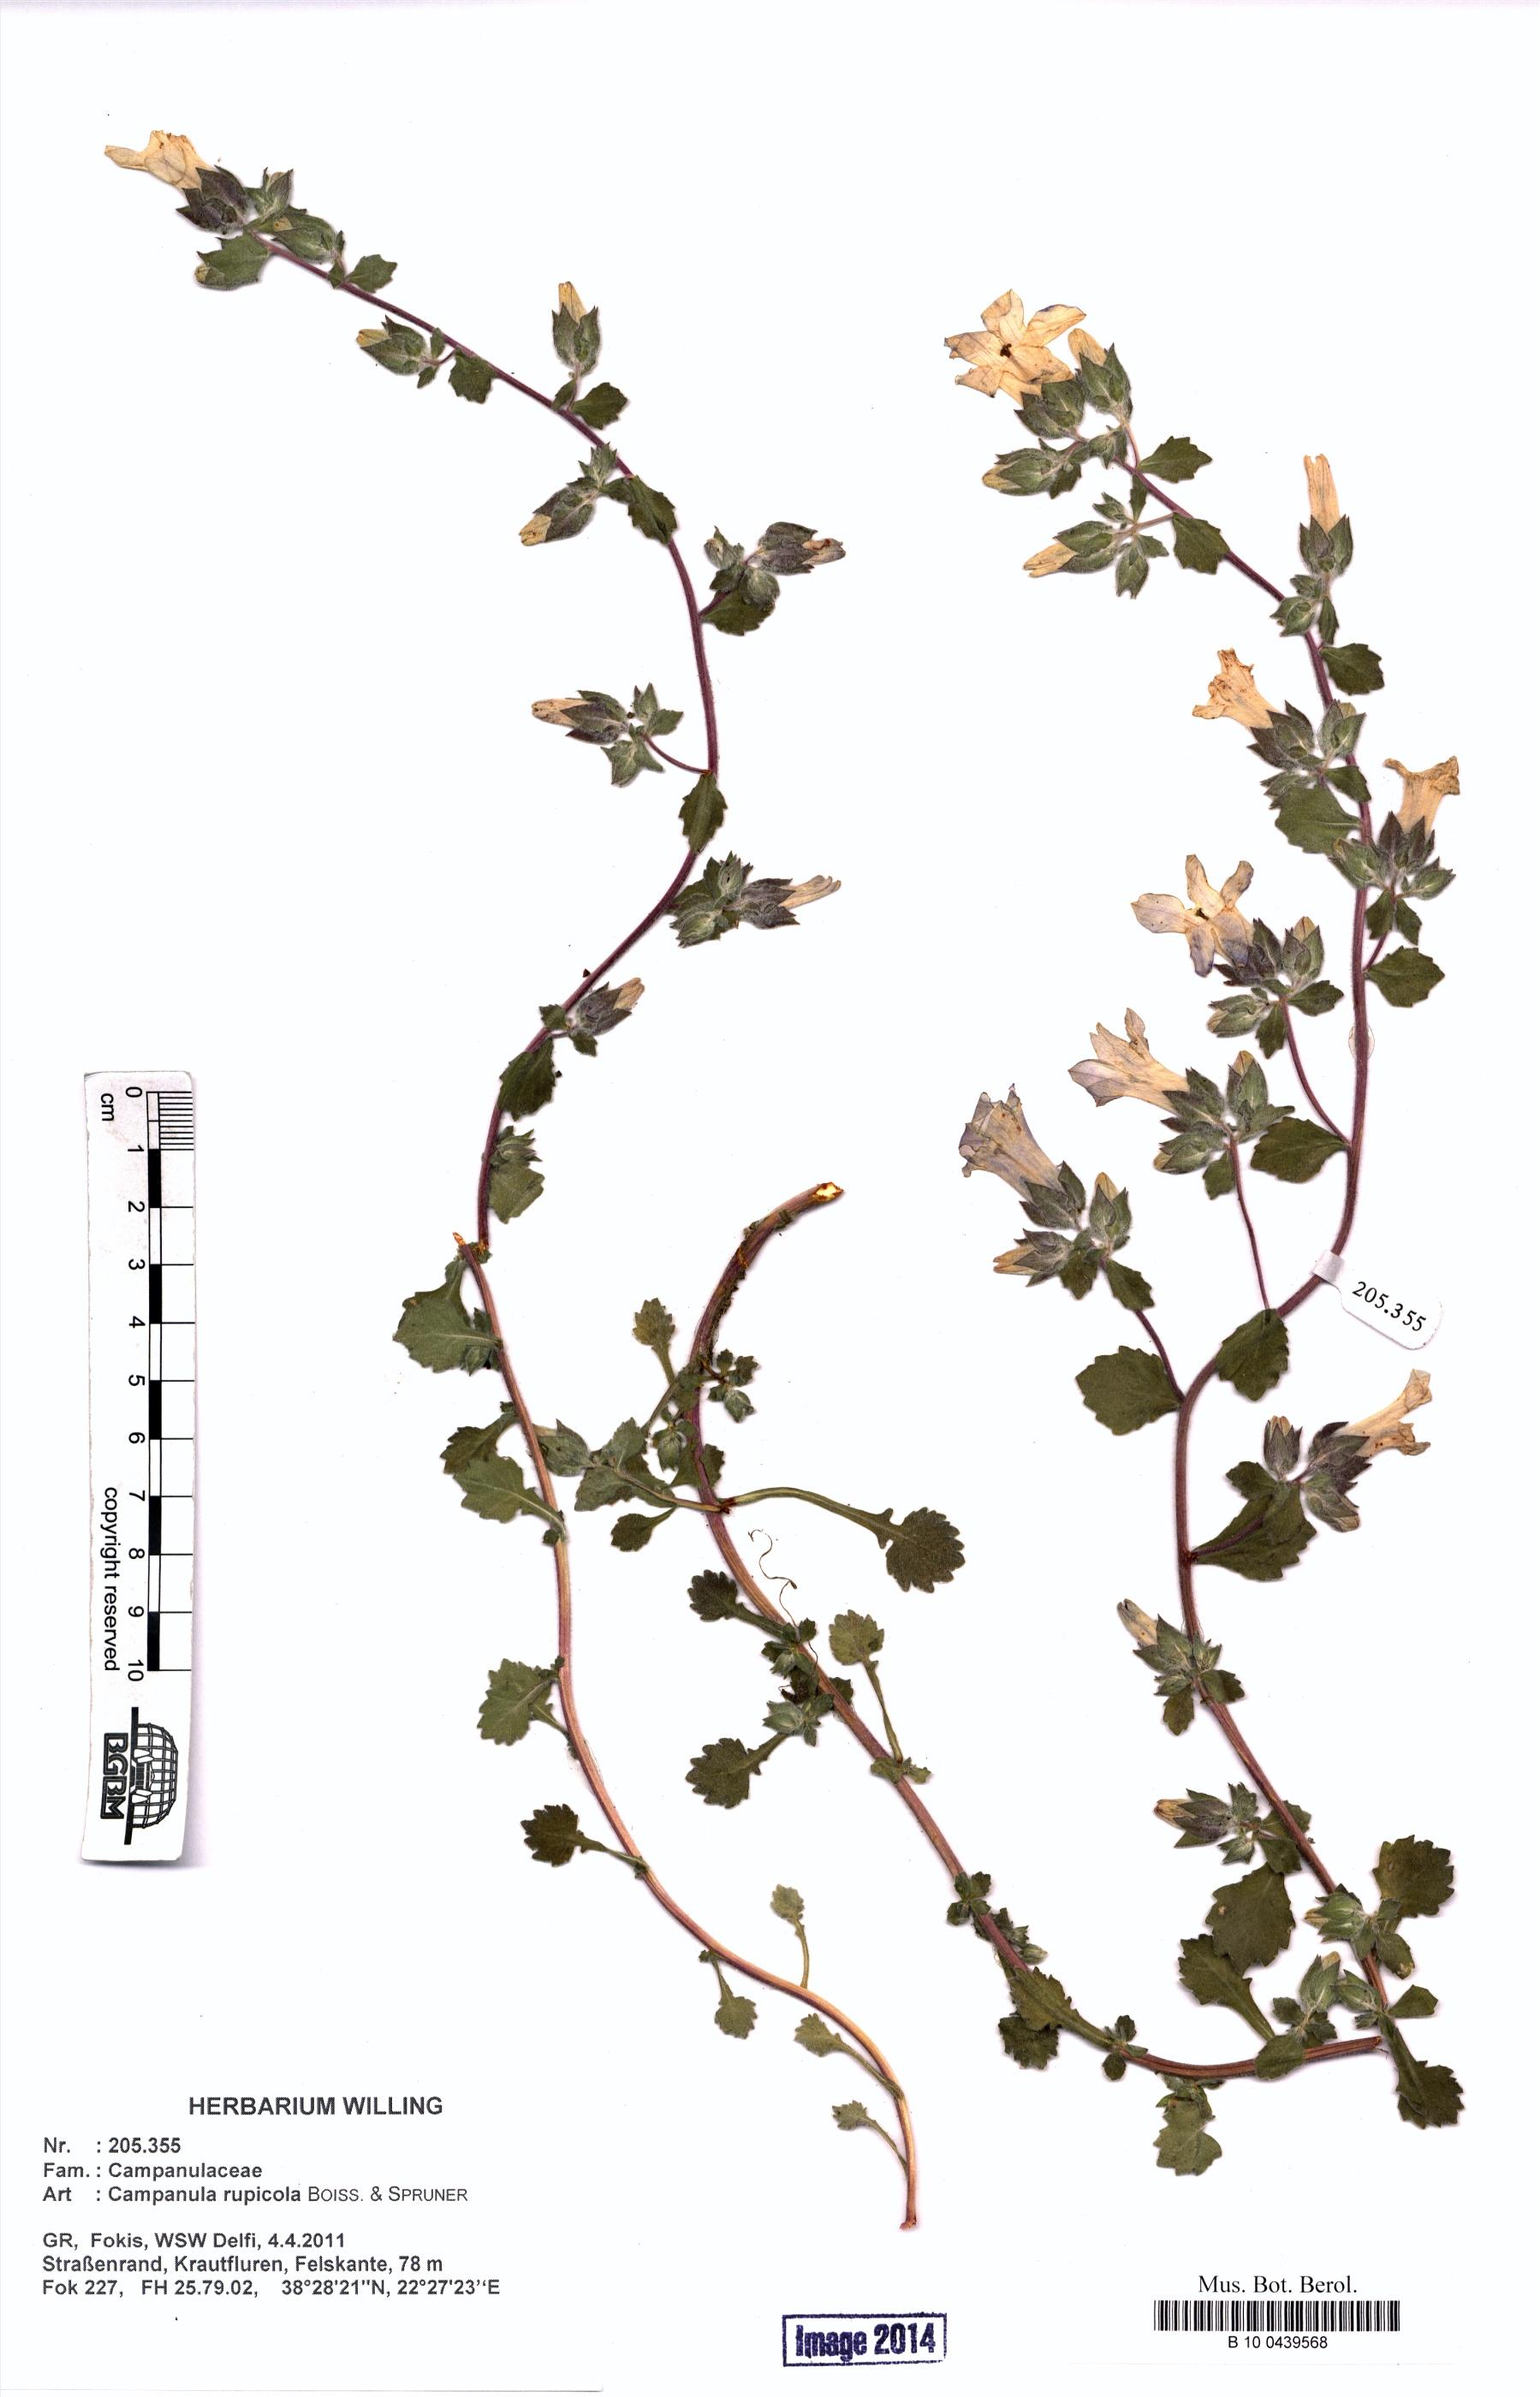 http://ww2.bgbm.org/herbarium/images/B/10/04/39/56/B_10_0439568.jpg